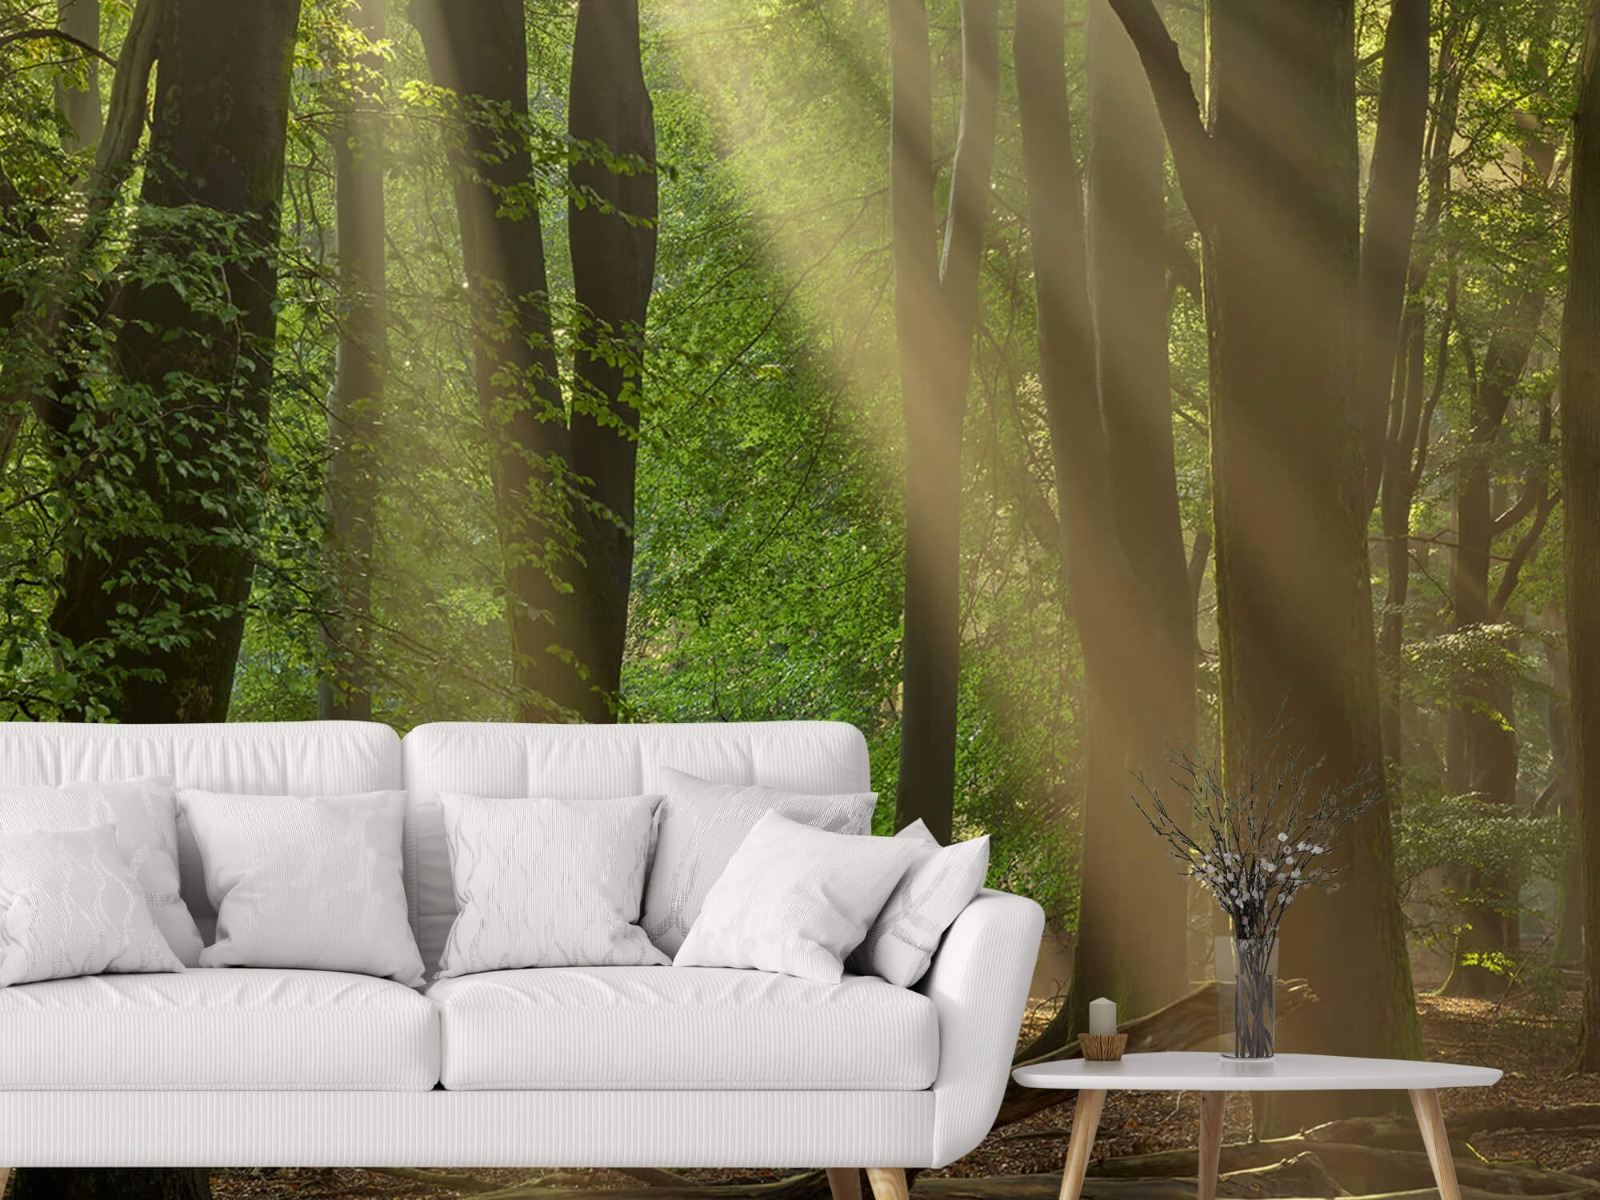 Bomen - Zonneharpen in het bos - Slaapkamer 7